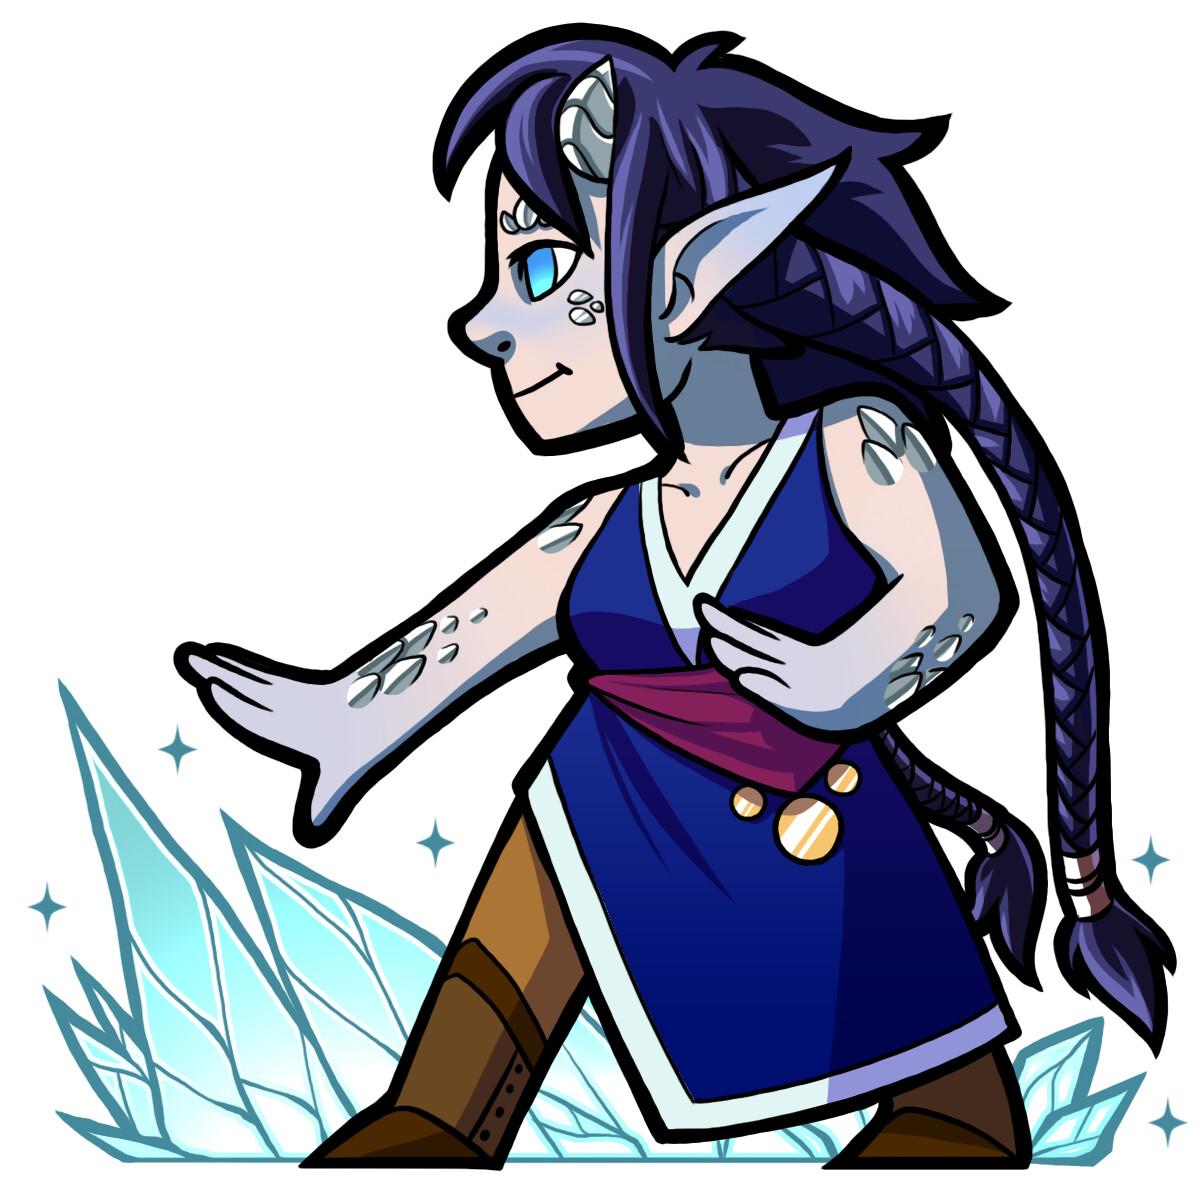 Vixen, a dragon-blooded sorceress.